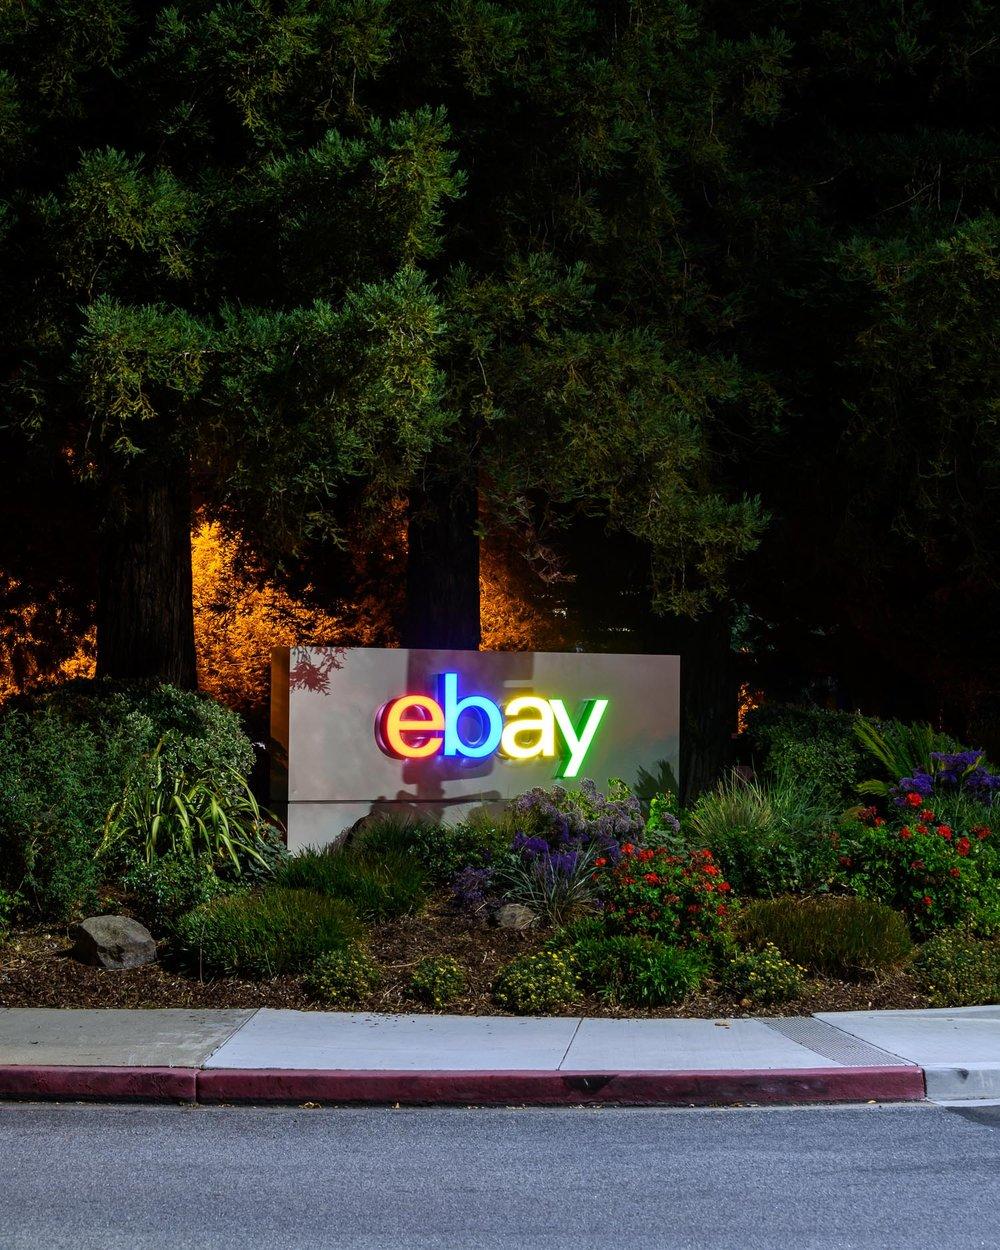 Ebay headquarters, San Jose